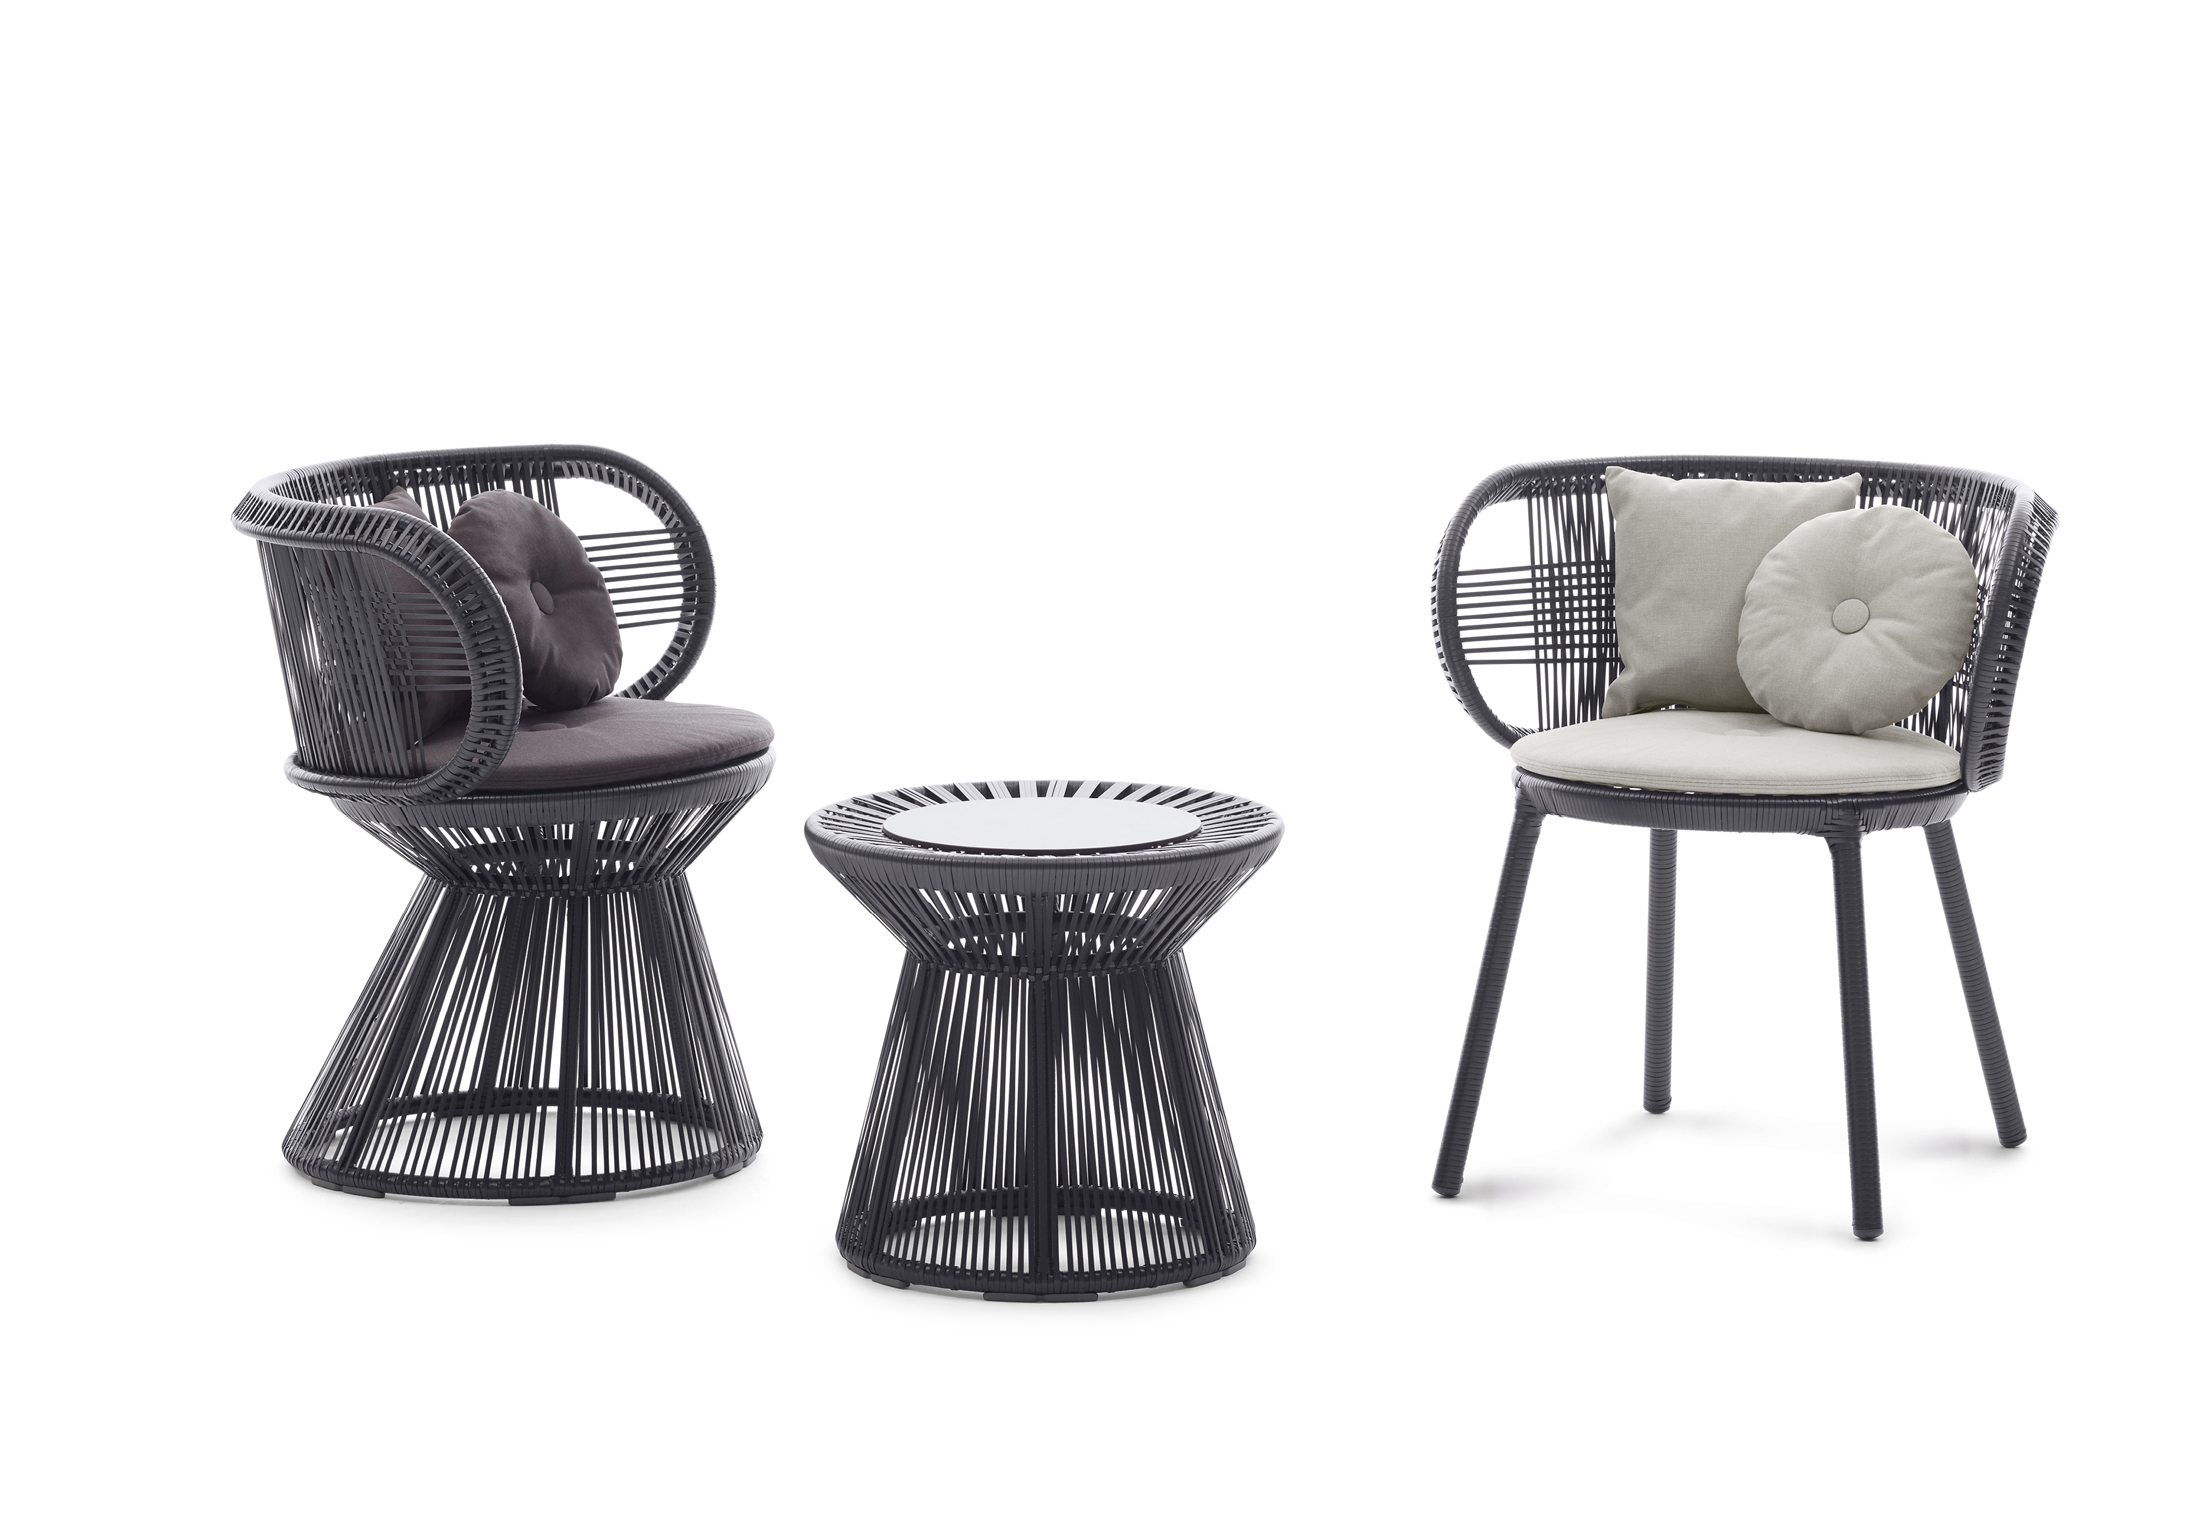 Awe Inspiring Cirql Lounge Chair By Dedon Stylepark Short Links Chair Design For Home Short Linksinfo